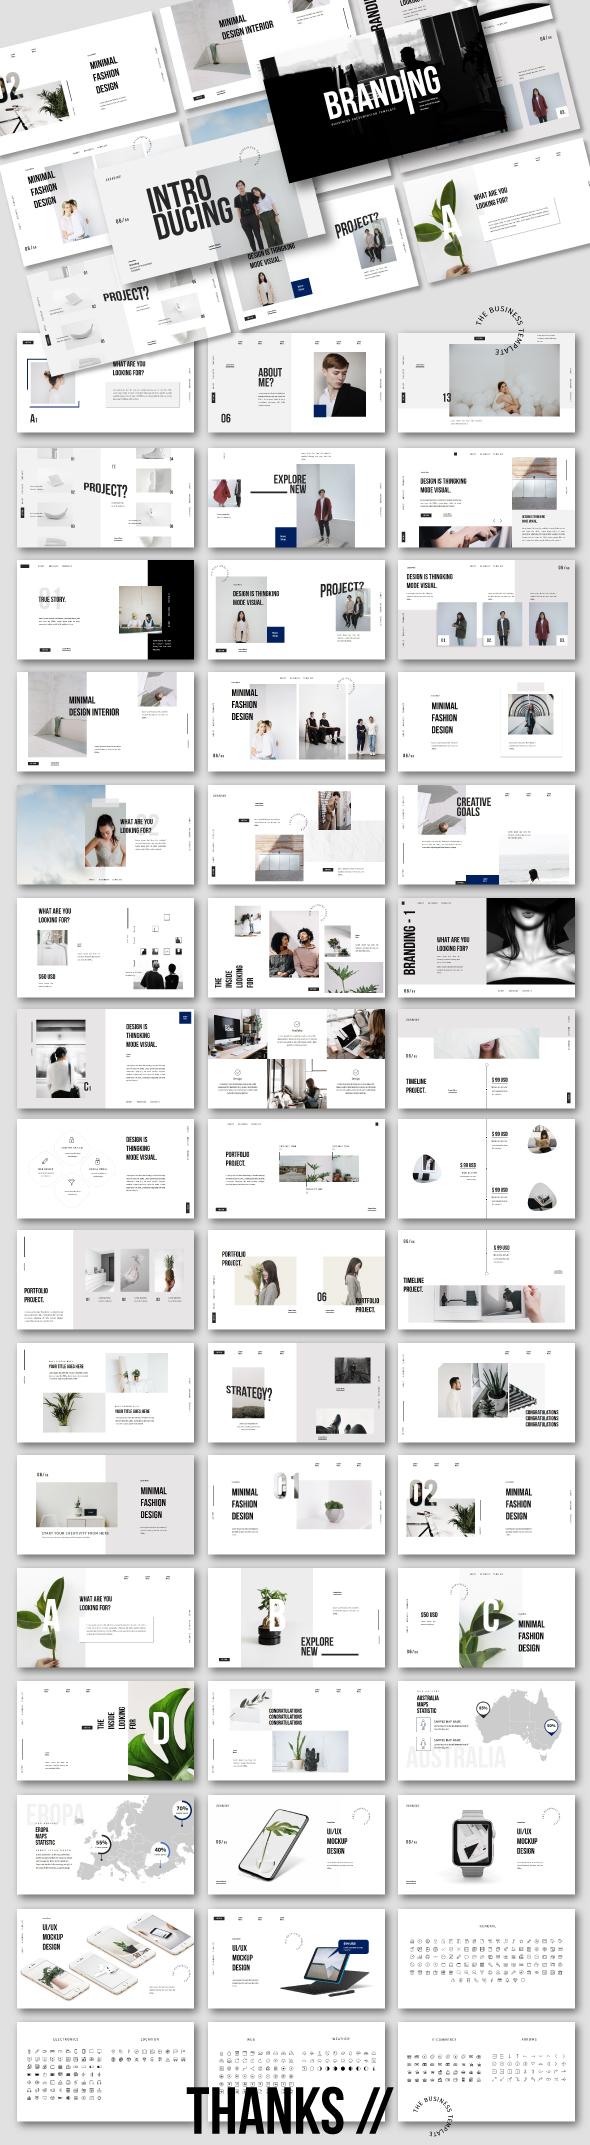 Branding - Business Powerpoint Template